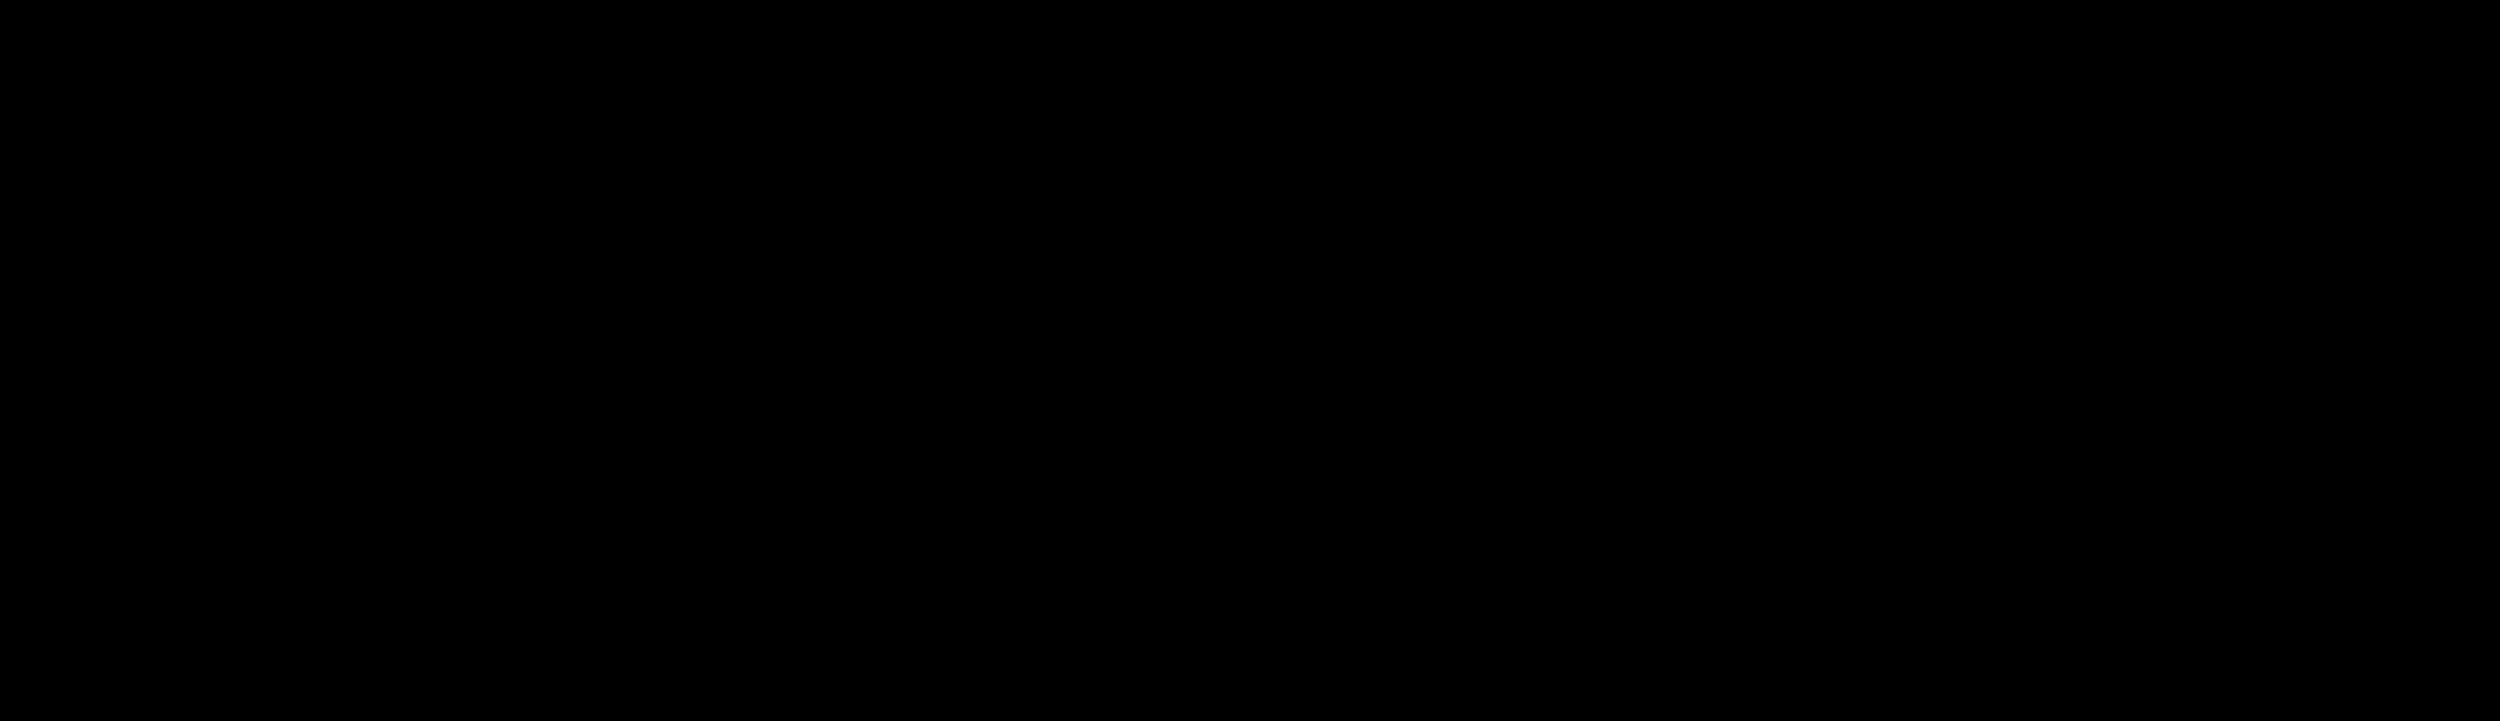 Osprey Imagery Logo - black.png